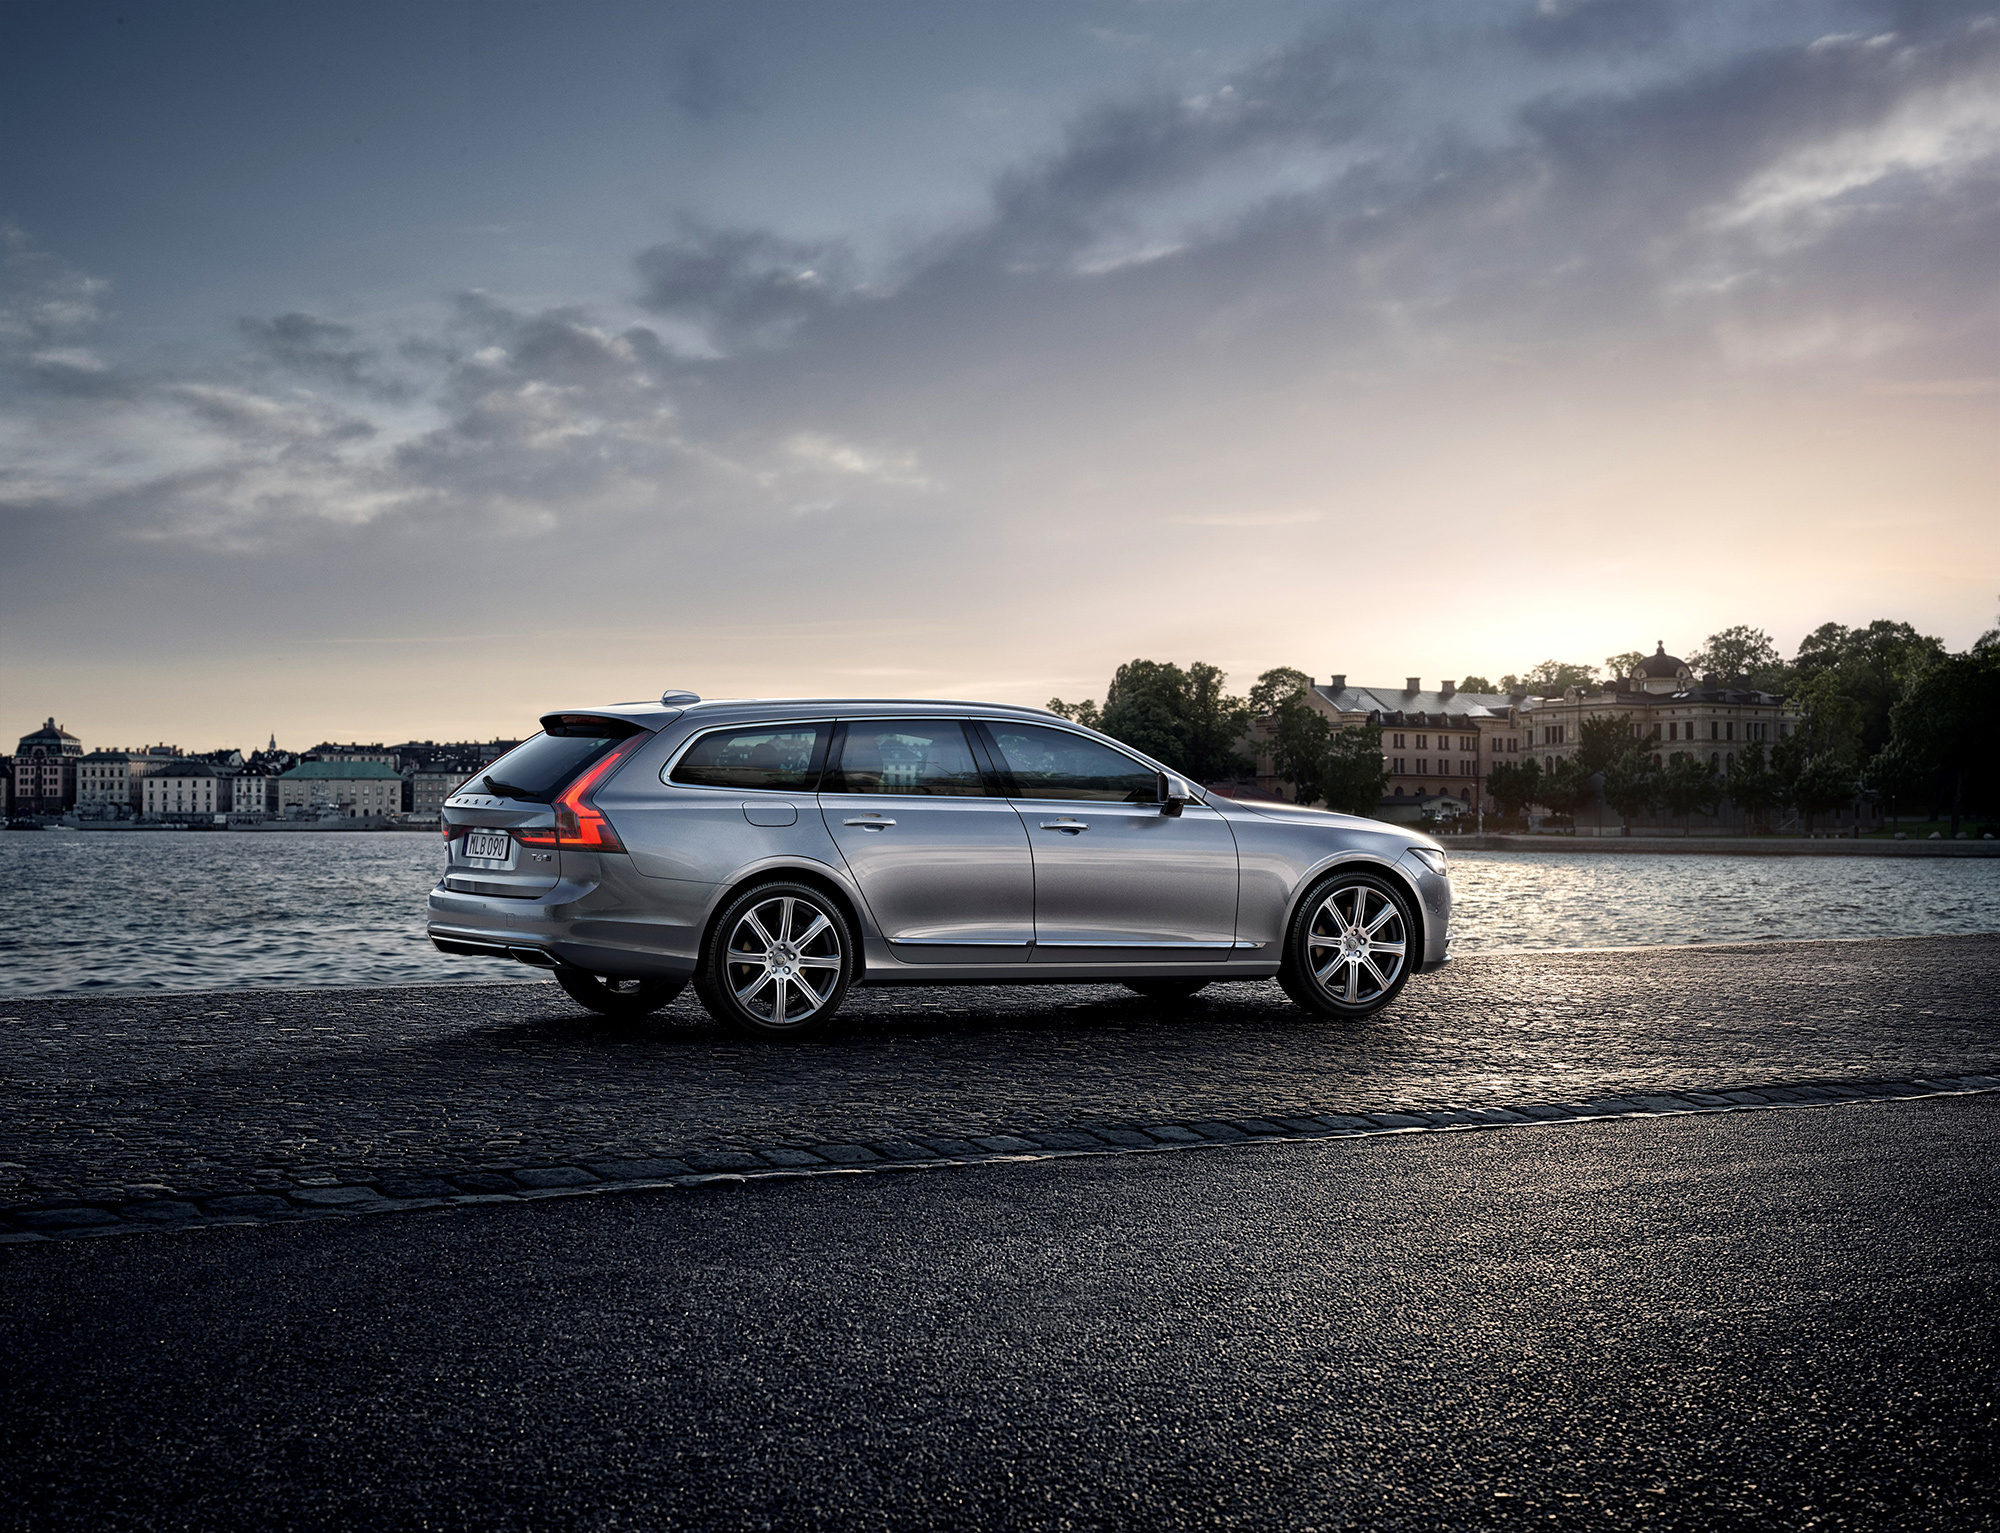 Volvo V90 HD Wallpaper